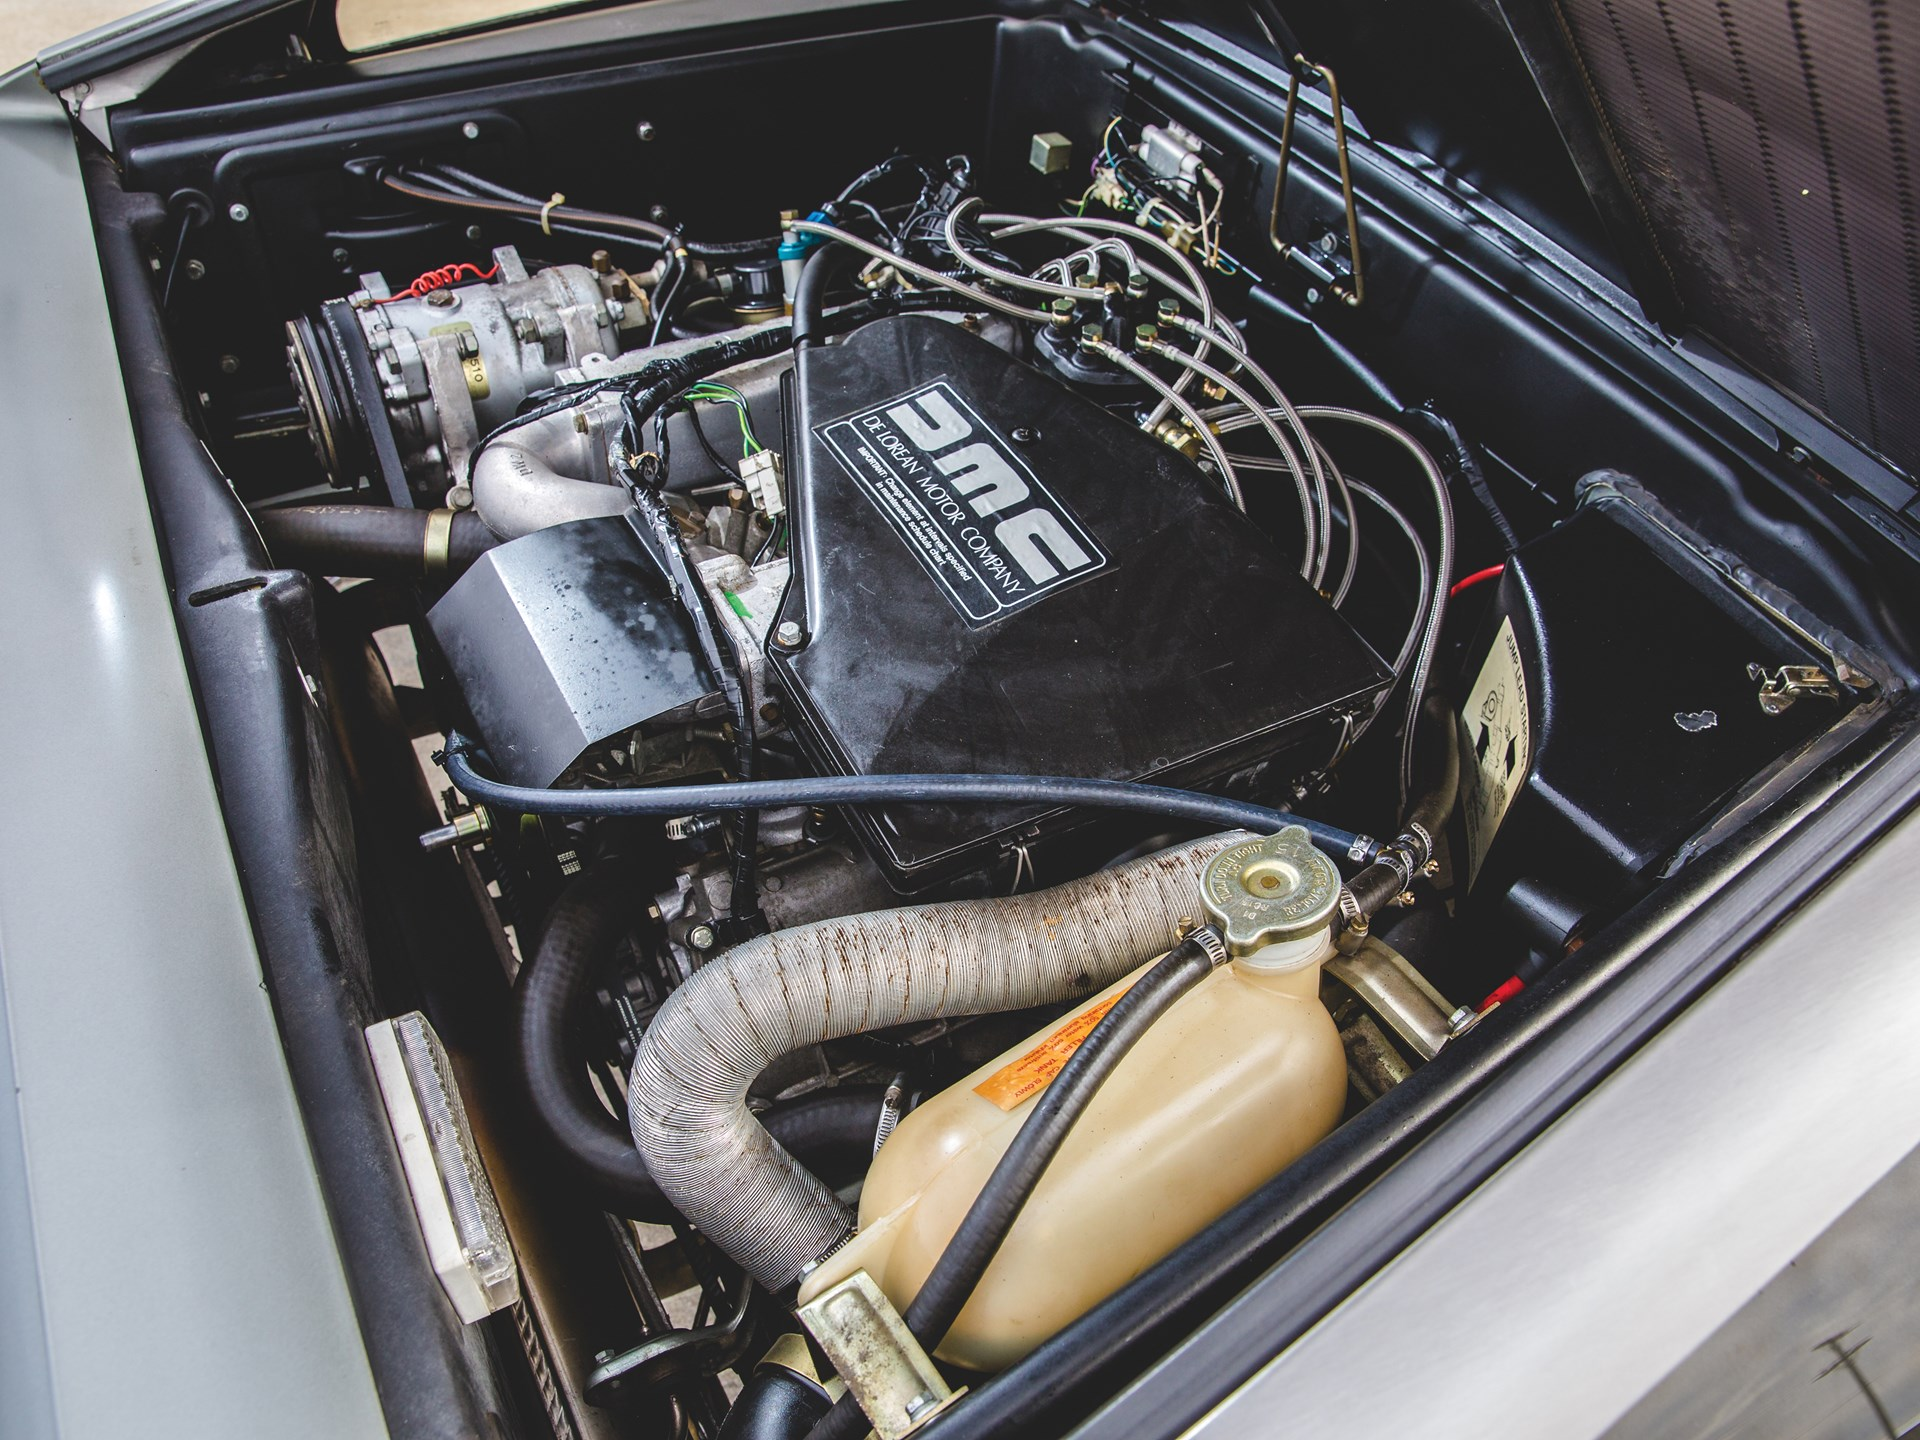 1981 DeLorean DMC-12 engine passenger